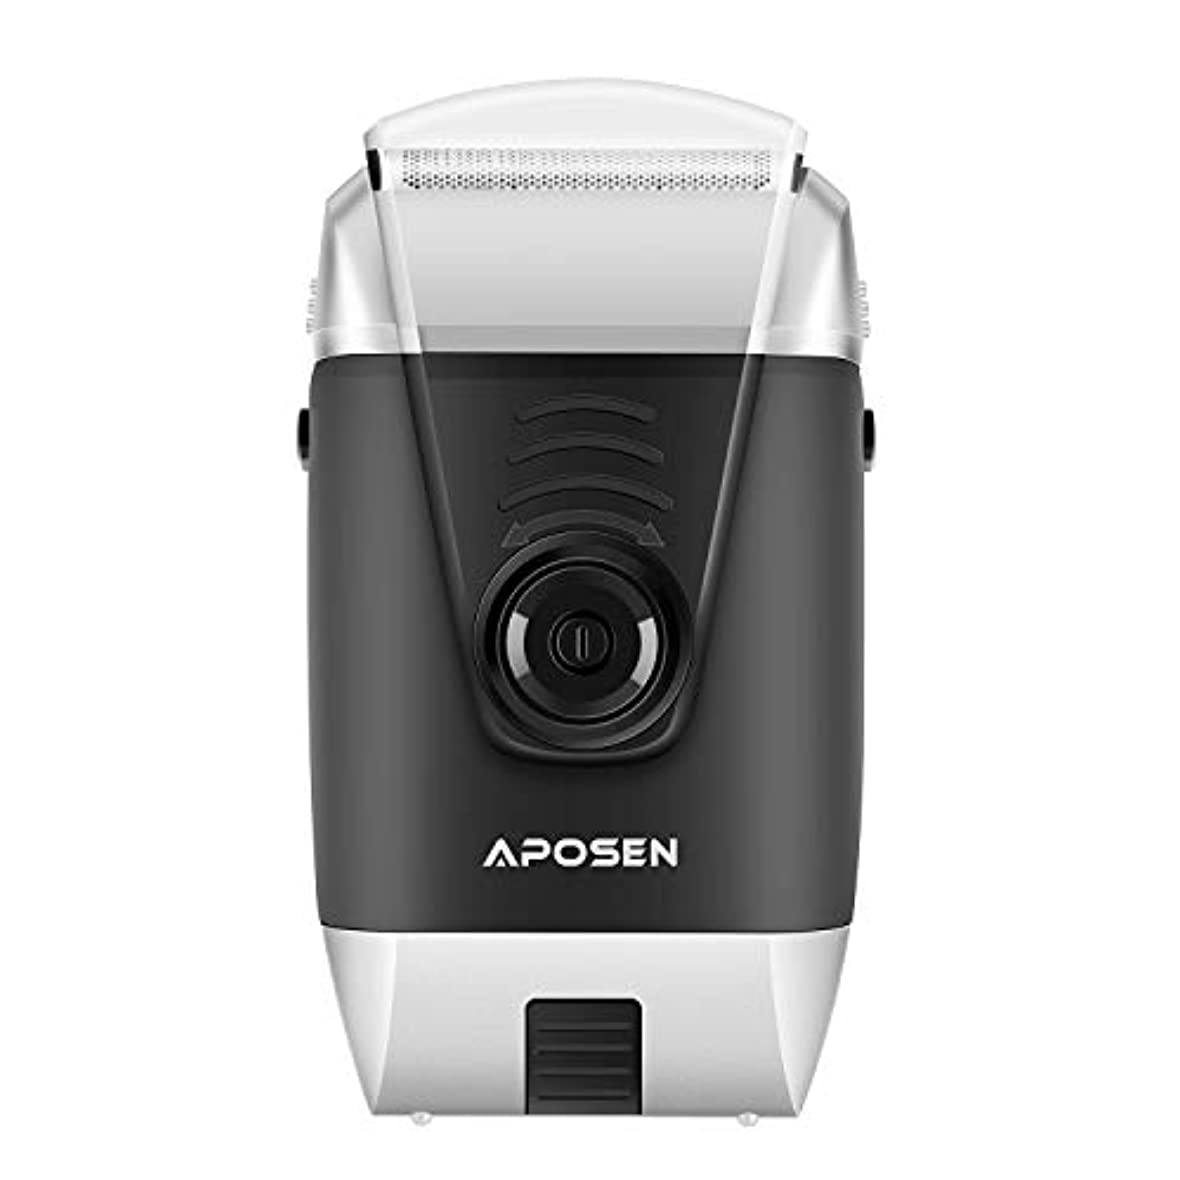 APOSEN電気シェーバー 髭剃り 剃毛用カミソリ付き USB充電 リチウム電池内蔵 800mAh 大容量旅行用 多機能 男女兼用